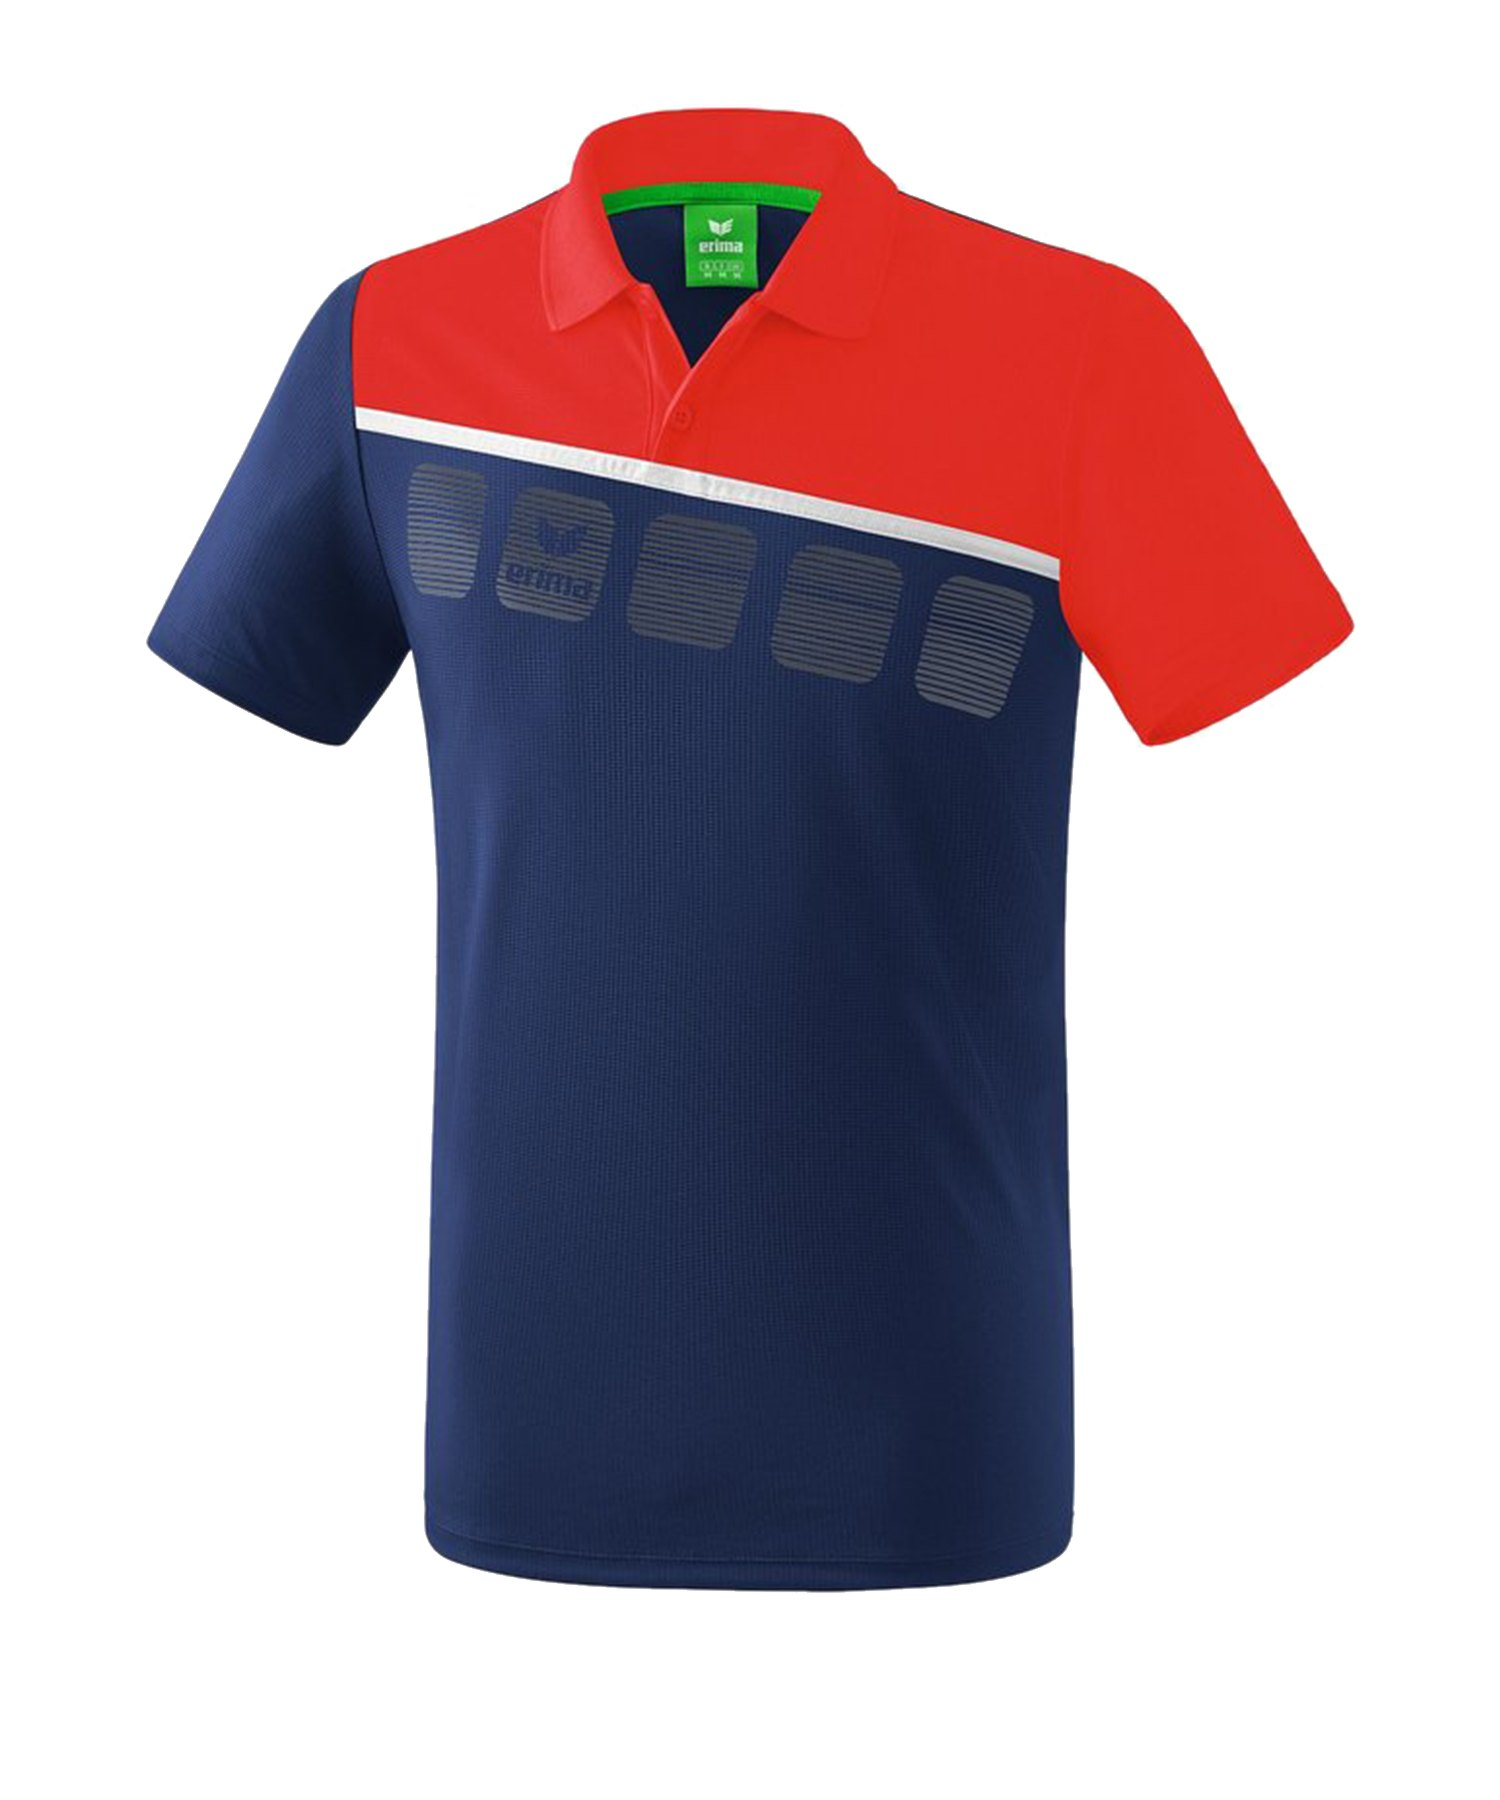 Erima 5-C Poloshirt Kids Blau Rot - Blau